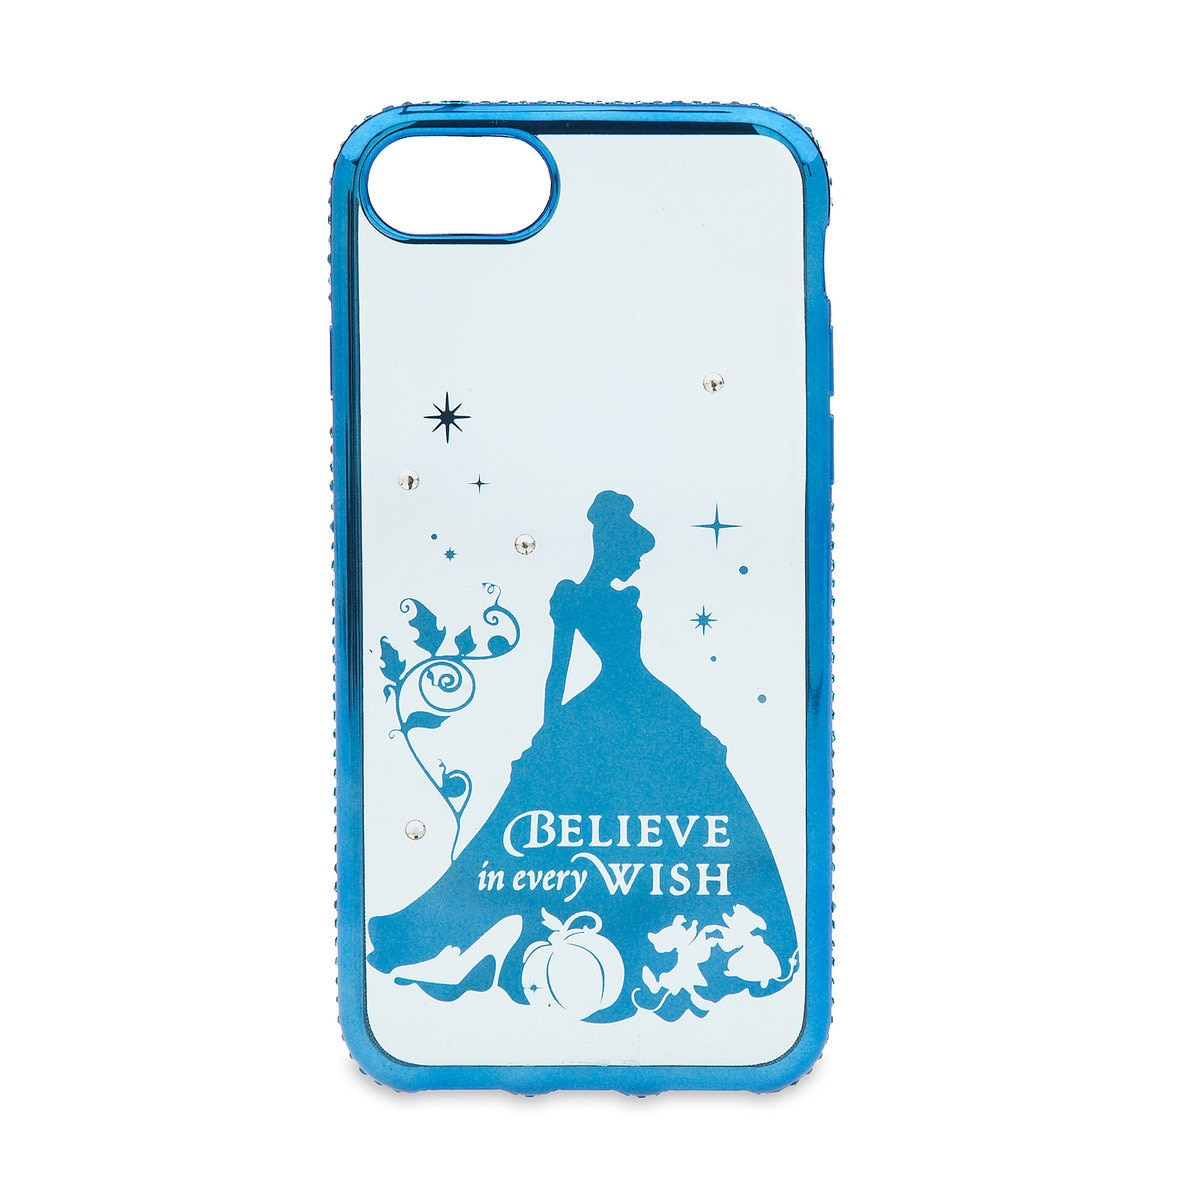 7d9898fa89ec62 Product Image of Cinderella iPhone 7/6/6S Case # 1